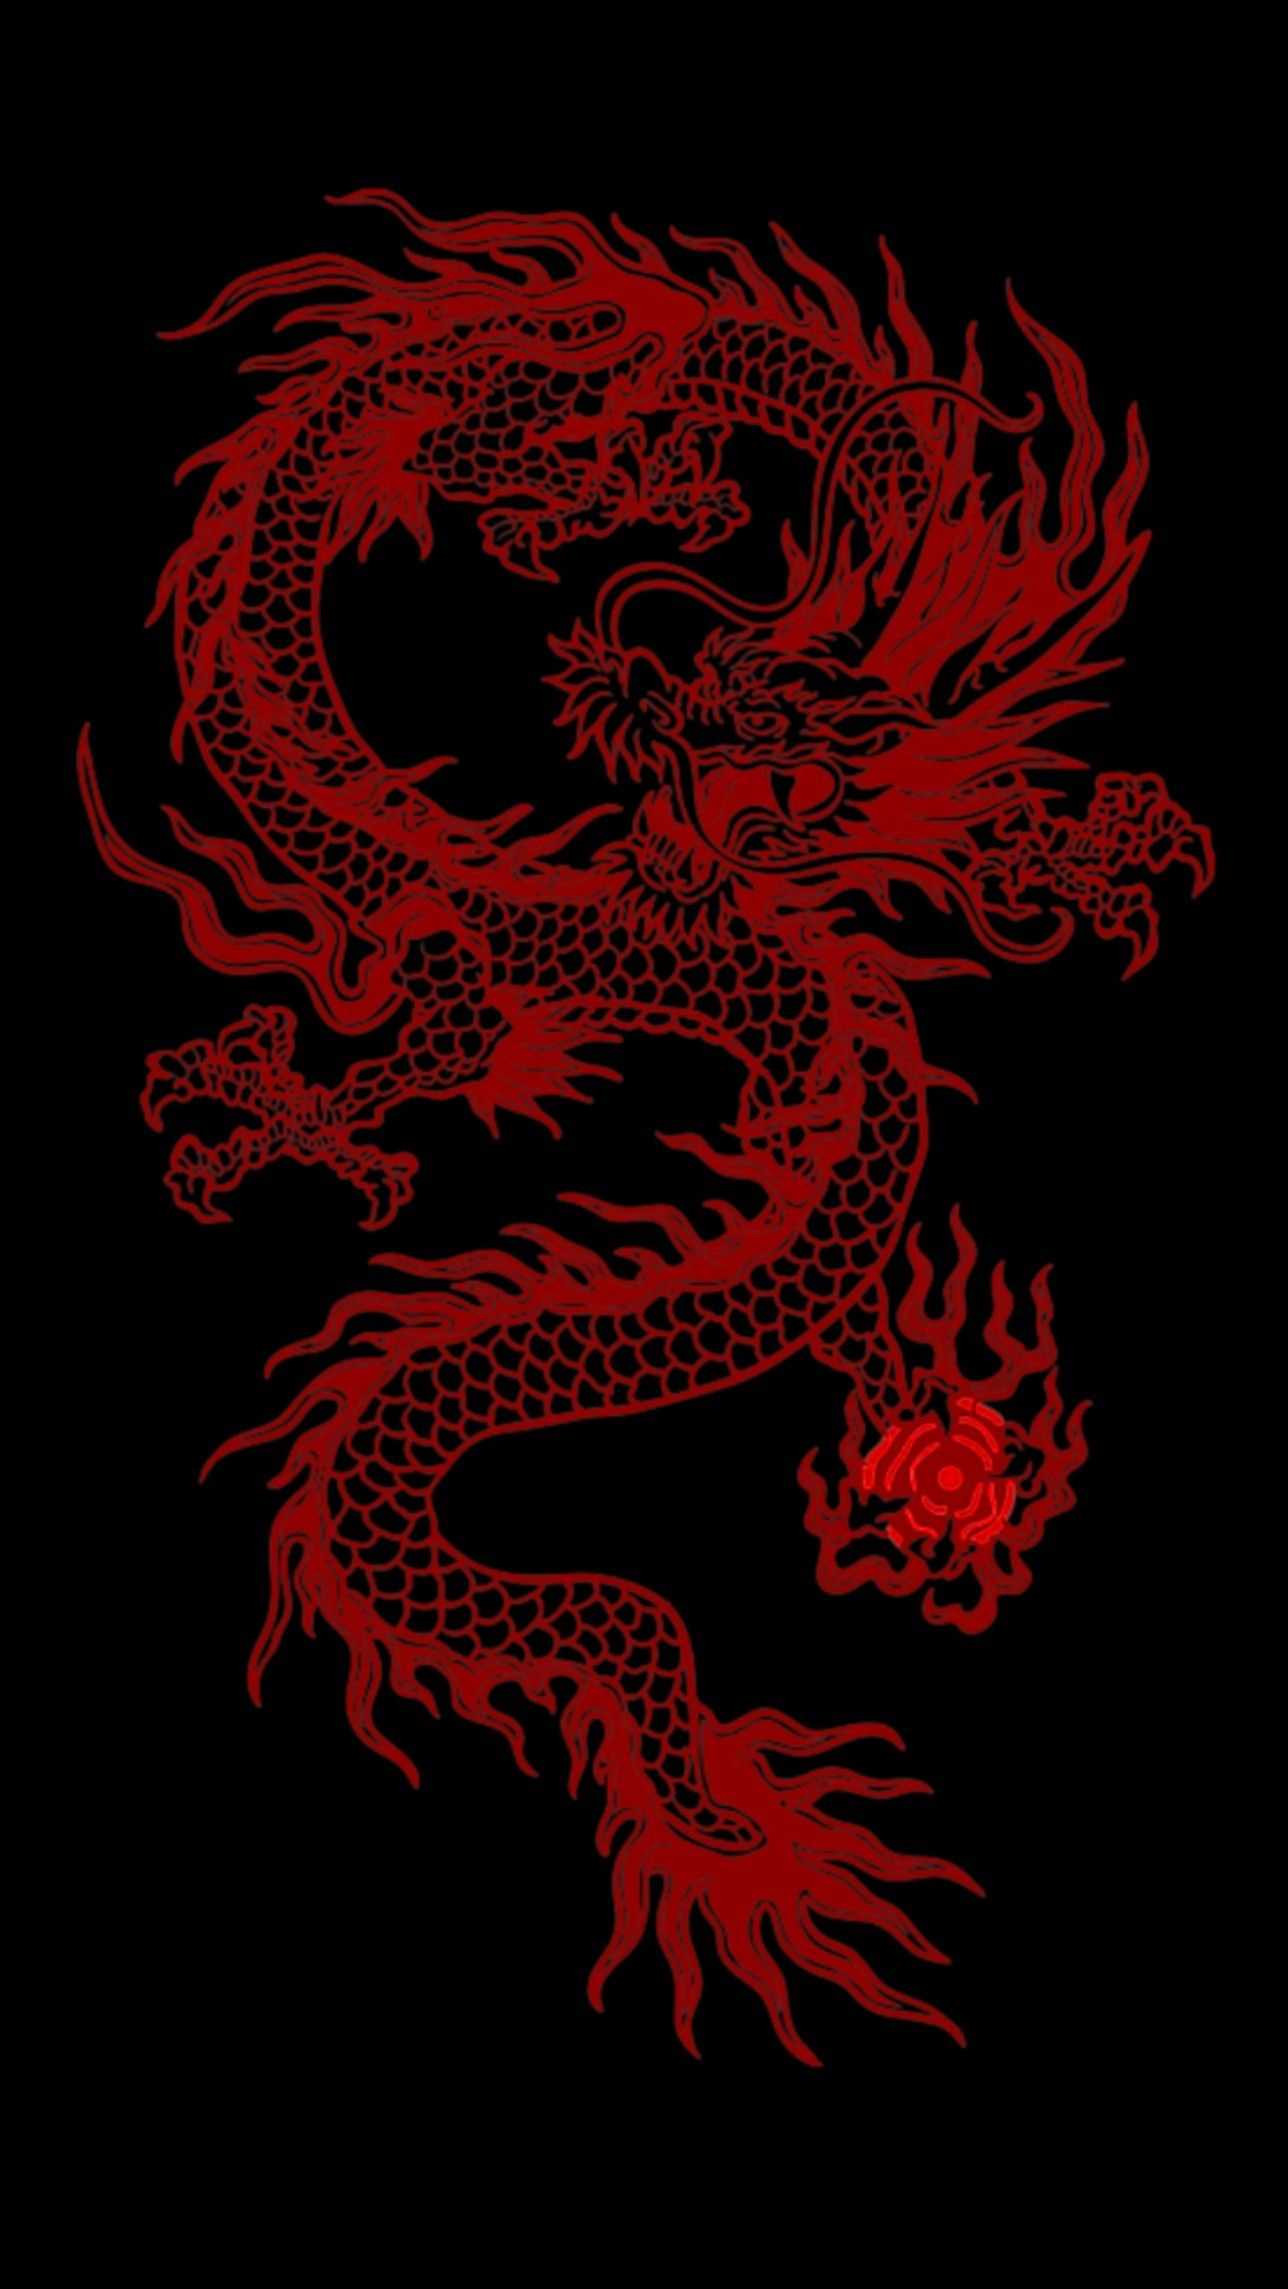 Red Dragon Snake Wallpaper Dragon Wallpaper Iphone Dark Red Wallpaper